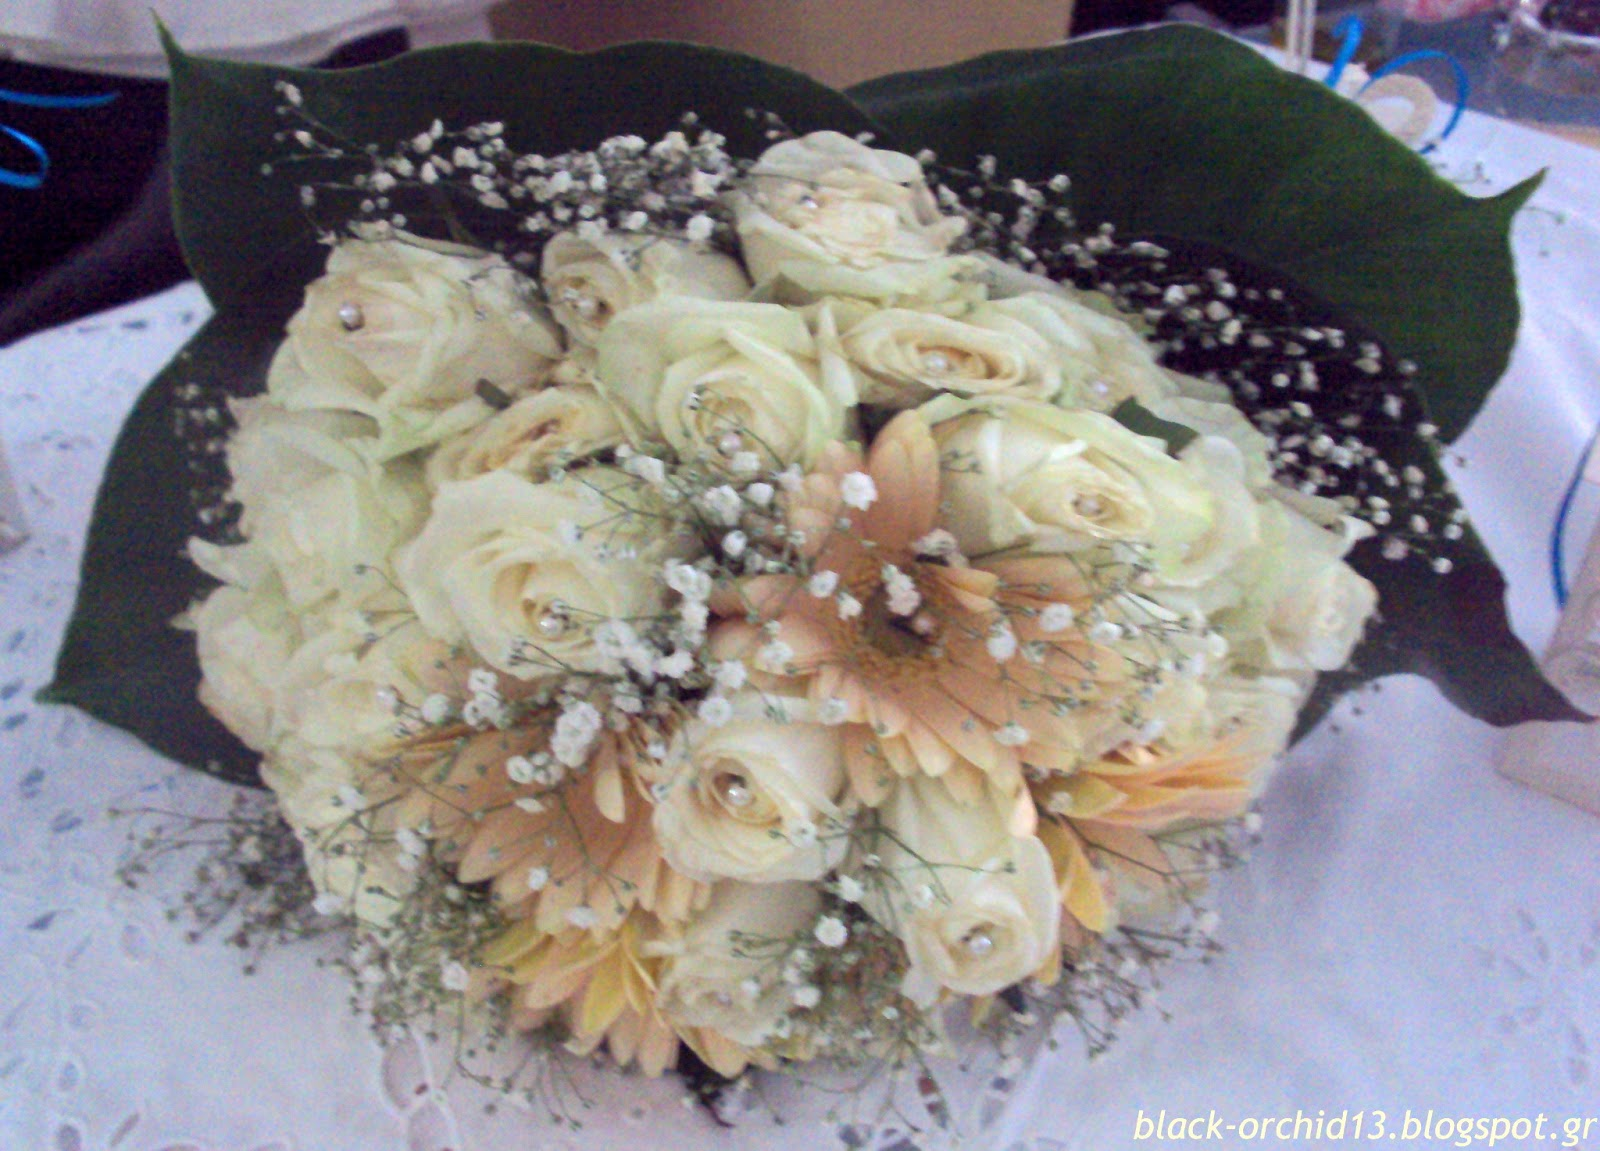 6b656abbd5d7 Νυφική ανθοδέσμη σε απαλά χρώματα. Ιβουάρ τριαντάφυλλα και σομόν ζέρμπερες  δίνουν ένα ιδανικό παλ αποτέλεσμα στην ανθοδέσμη του γάμου σας.